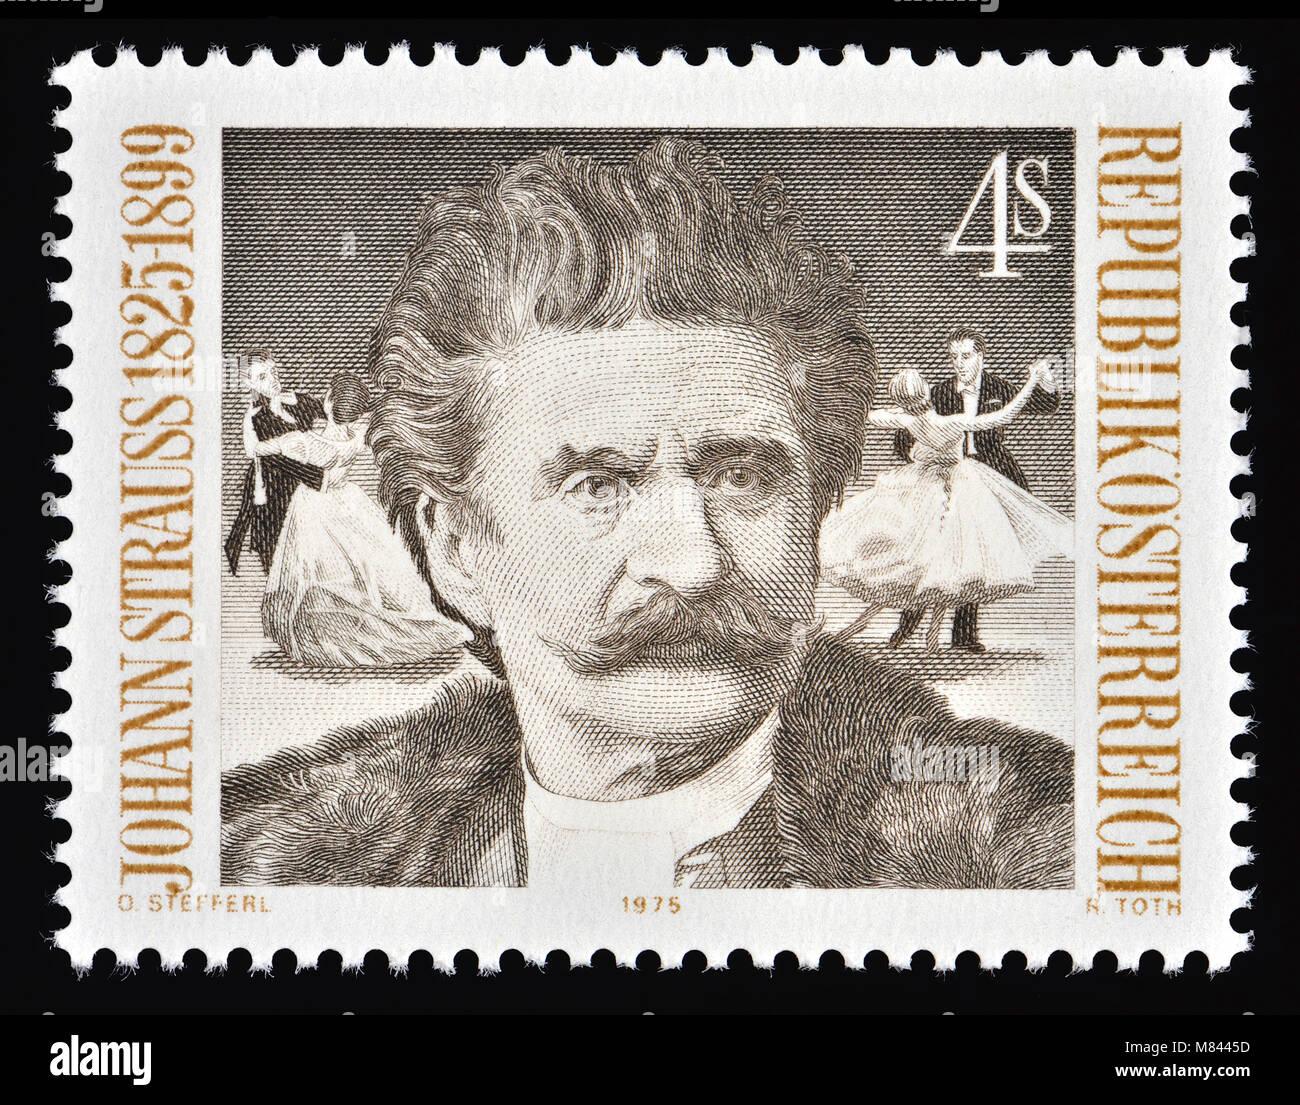 Austrian postage stamp (1975) : Johann Strauss II / Johann Strauss Jr /  the Younger (1825 – 1899) son of Johann Stock Photo